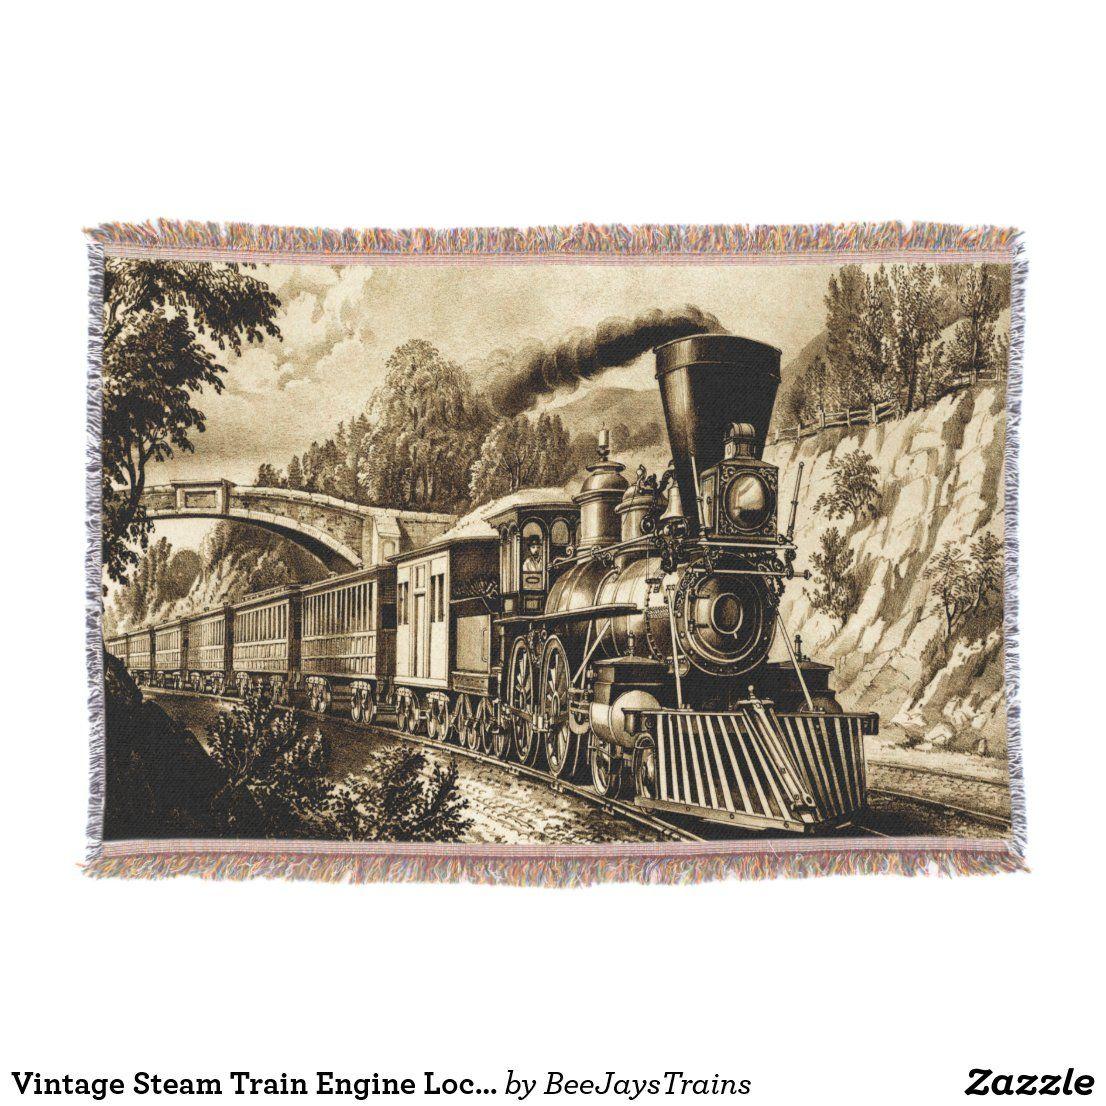 Vintage Steam Train Engine Locomotive Sepia Throw Blanket Zazzle Com Blue Throw Blanket Train Engines Blue Throws